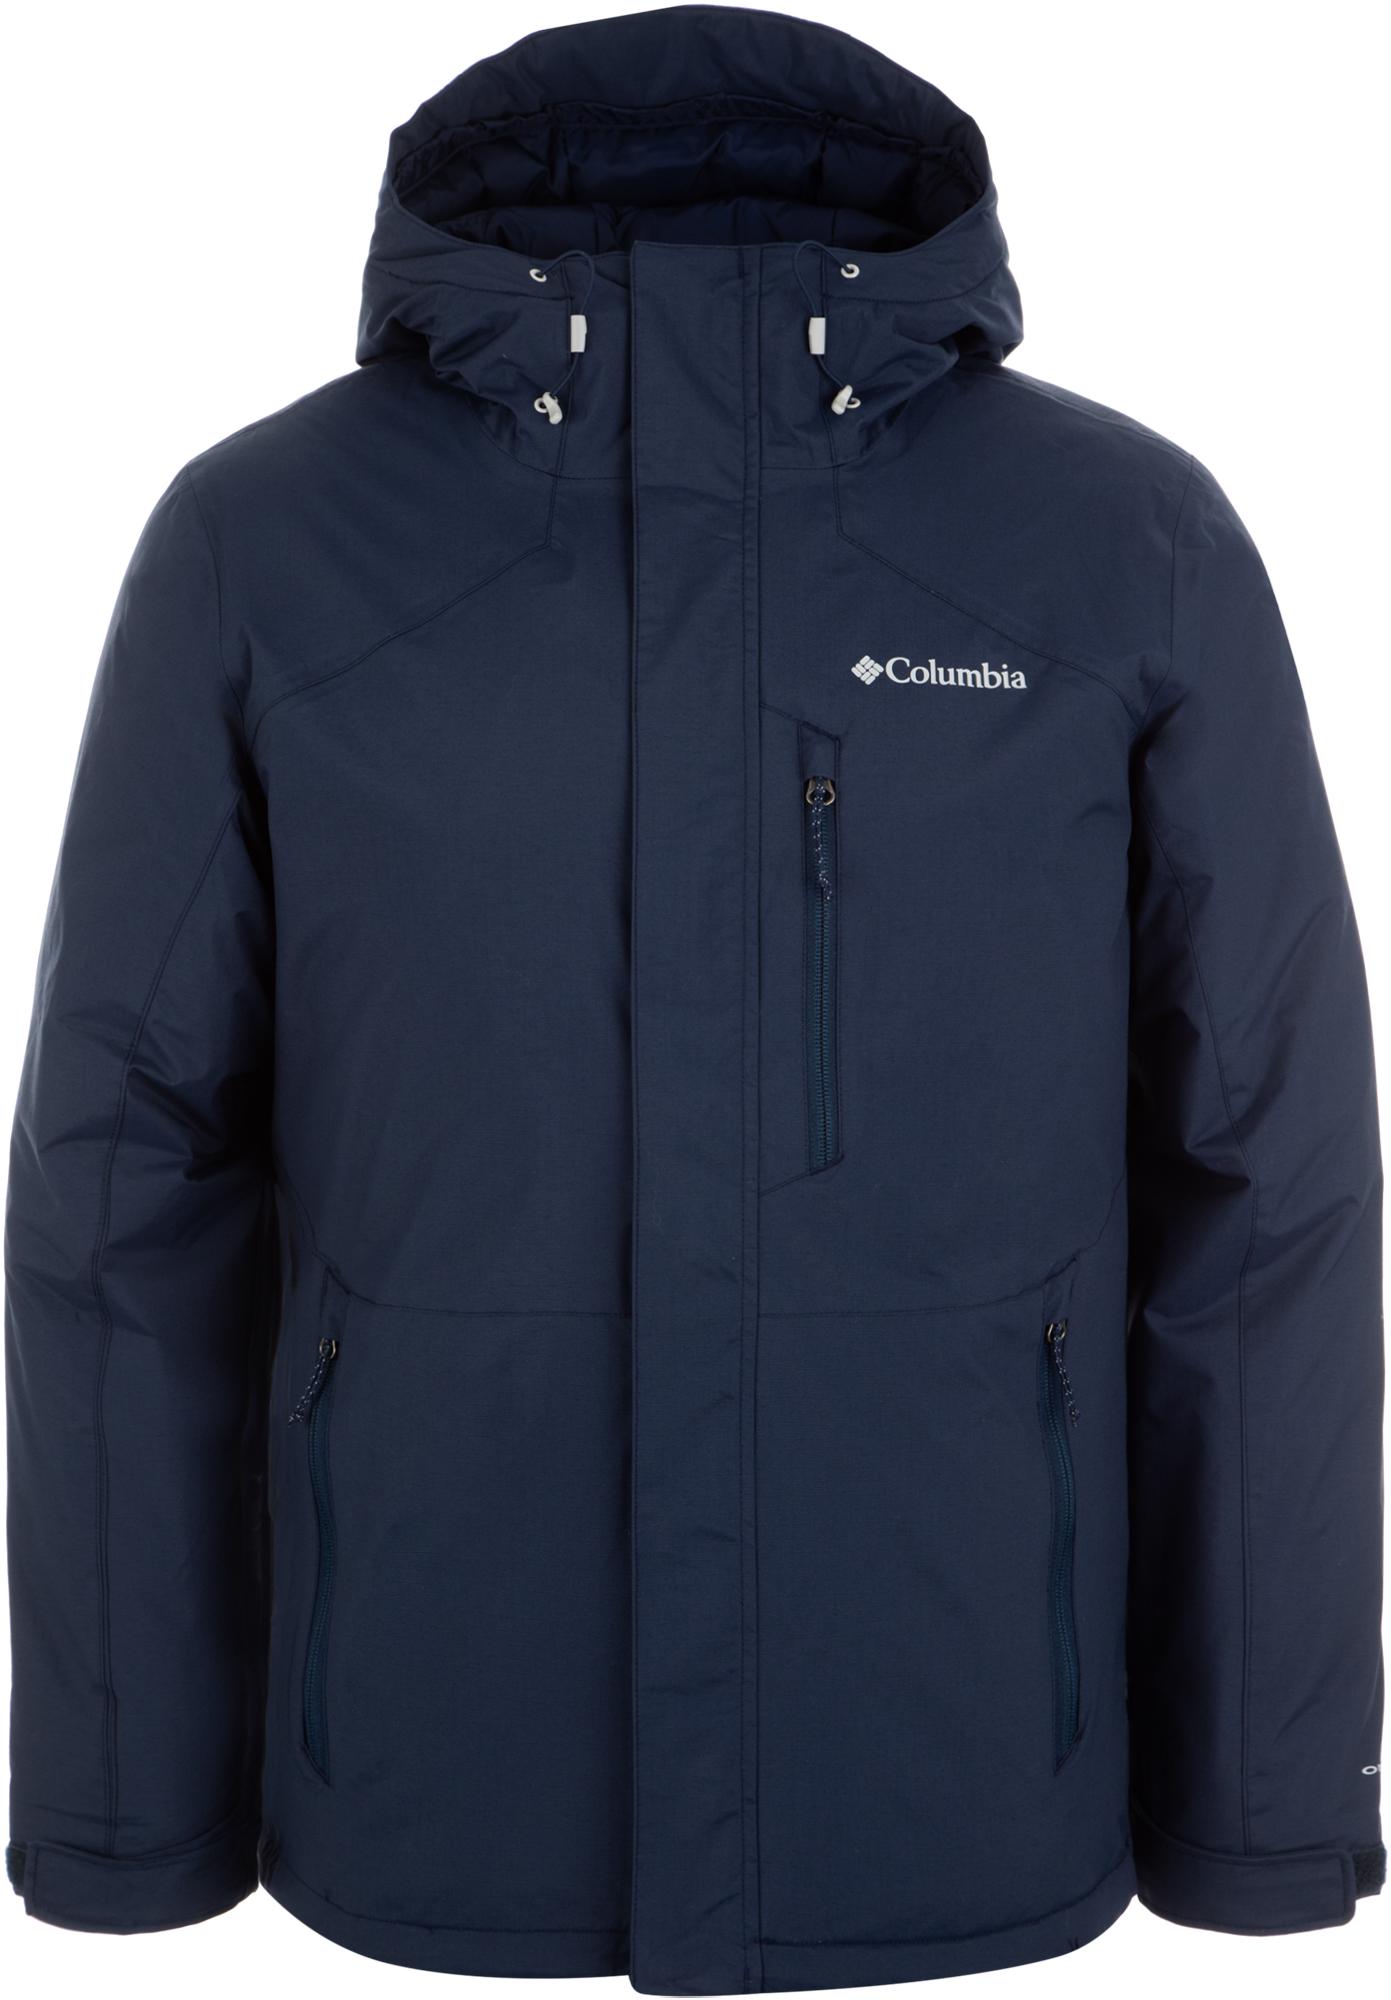 Columbia Куртка утепленная мужская Columbia Murr Peak II, размер 56-58 цены